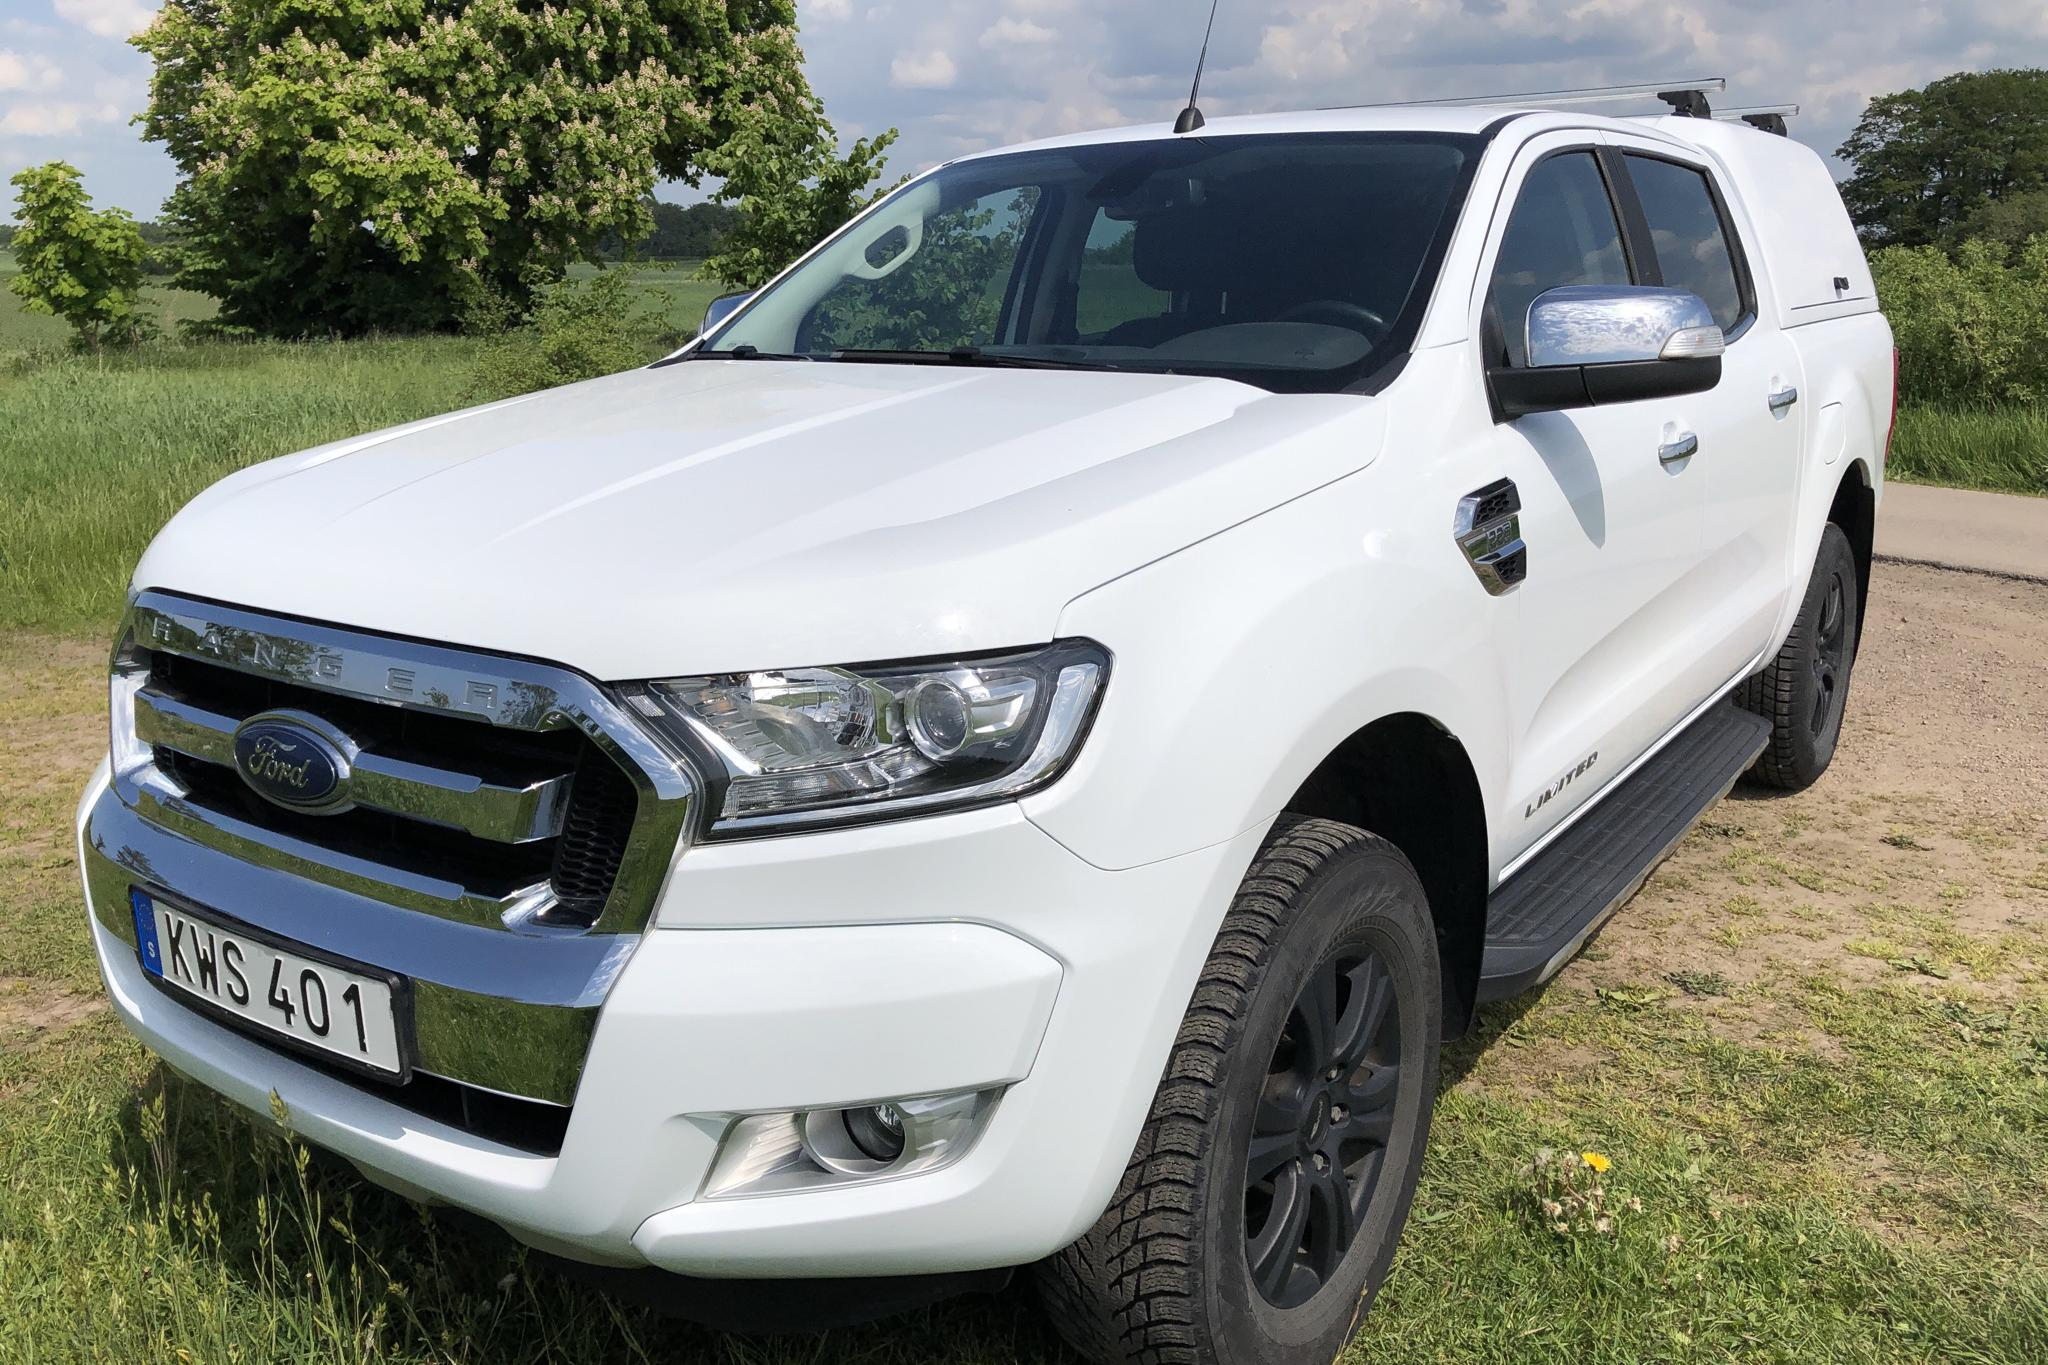 Ford Ranger 2.2 TDCi 4WD (160hk) - 10 333 mil - Automat - vit - 2018